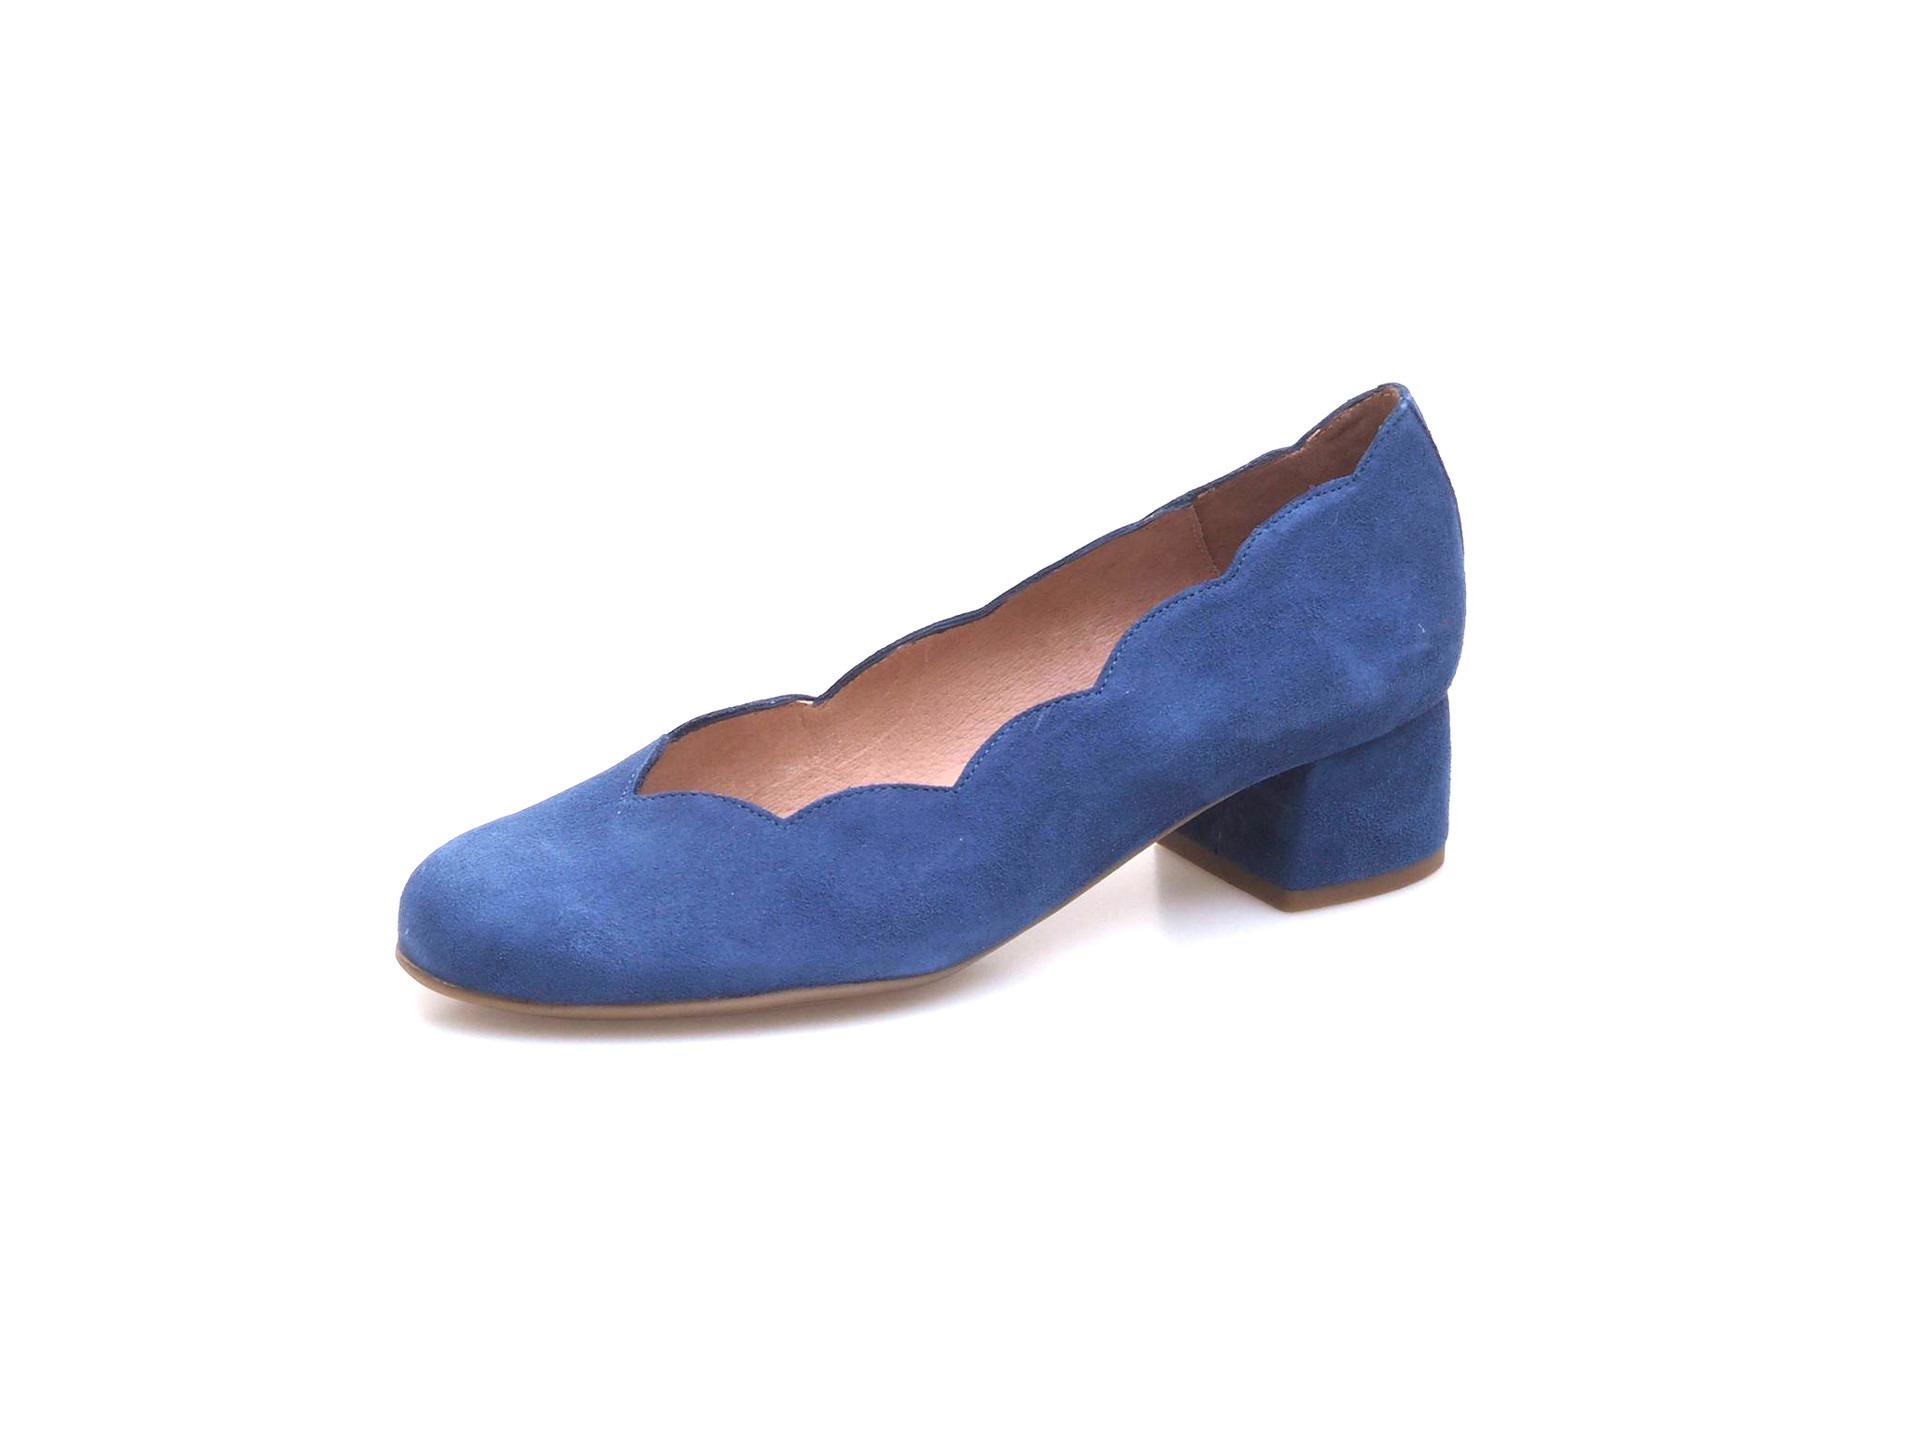 Soňa - Dámska obuv - Lodičky - Dámska lodička na nízkom podpätku ... dfc63fdd4d3